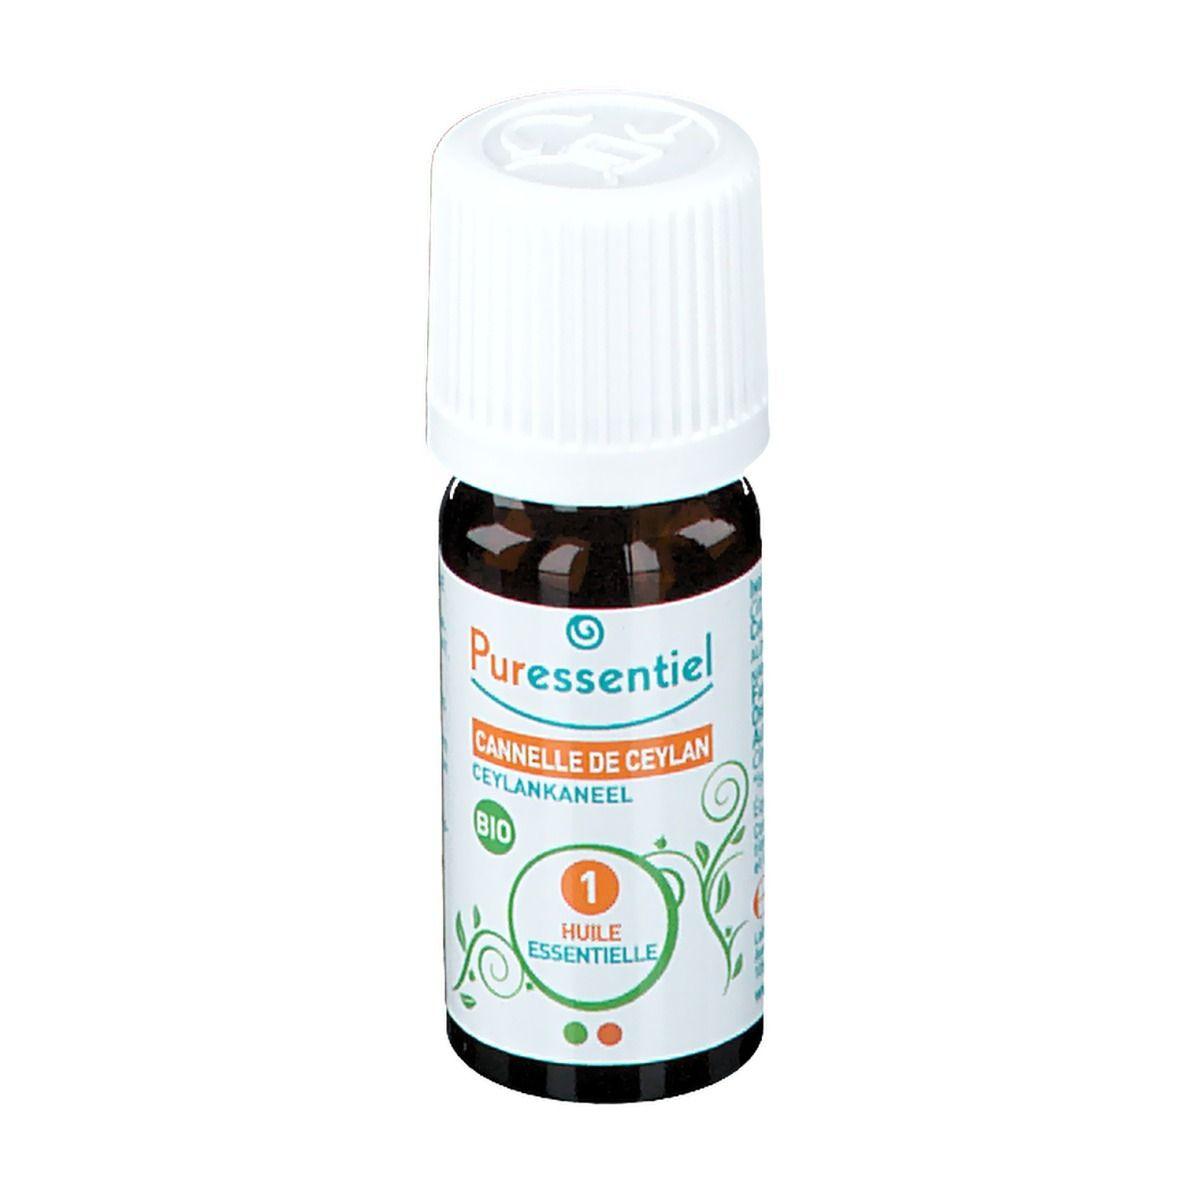 Puressentiel Expert Cannelle Ceylon Bio Huile Essentielle ml huile